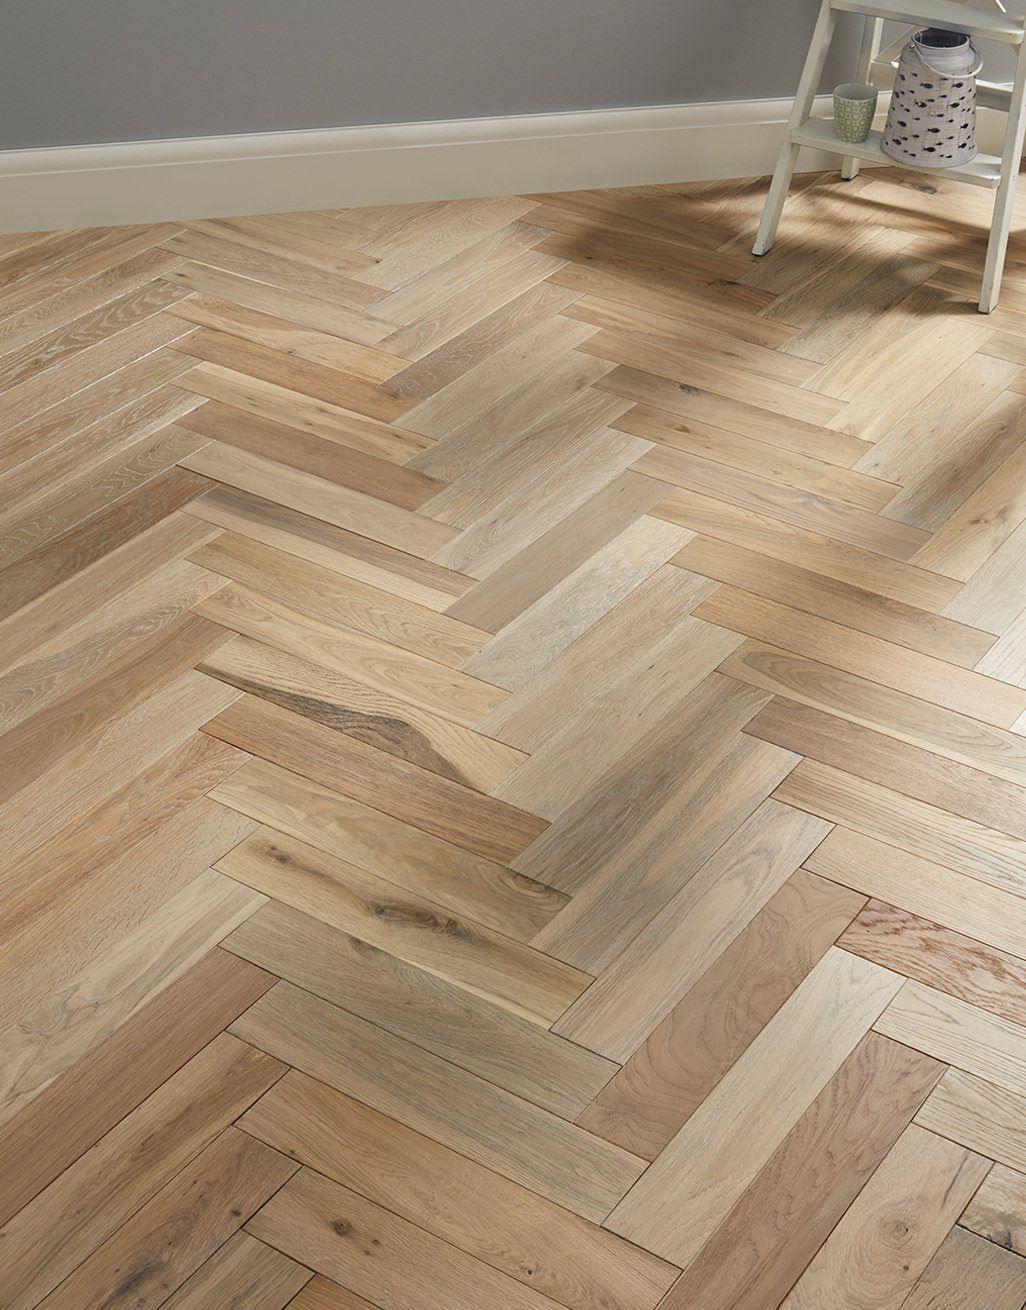 Oxford Herringbone Sandstone Oak Engineered Wood Flooring Direct Wood Flooring In 2020 Herringbone Wood Engineered Wood Floors Wood Floors Wide Plank